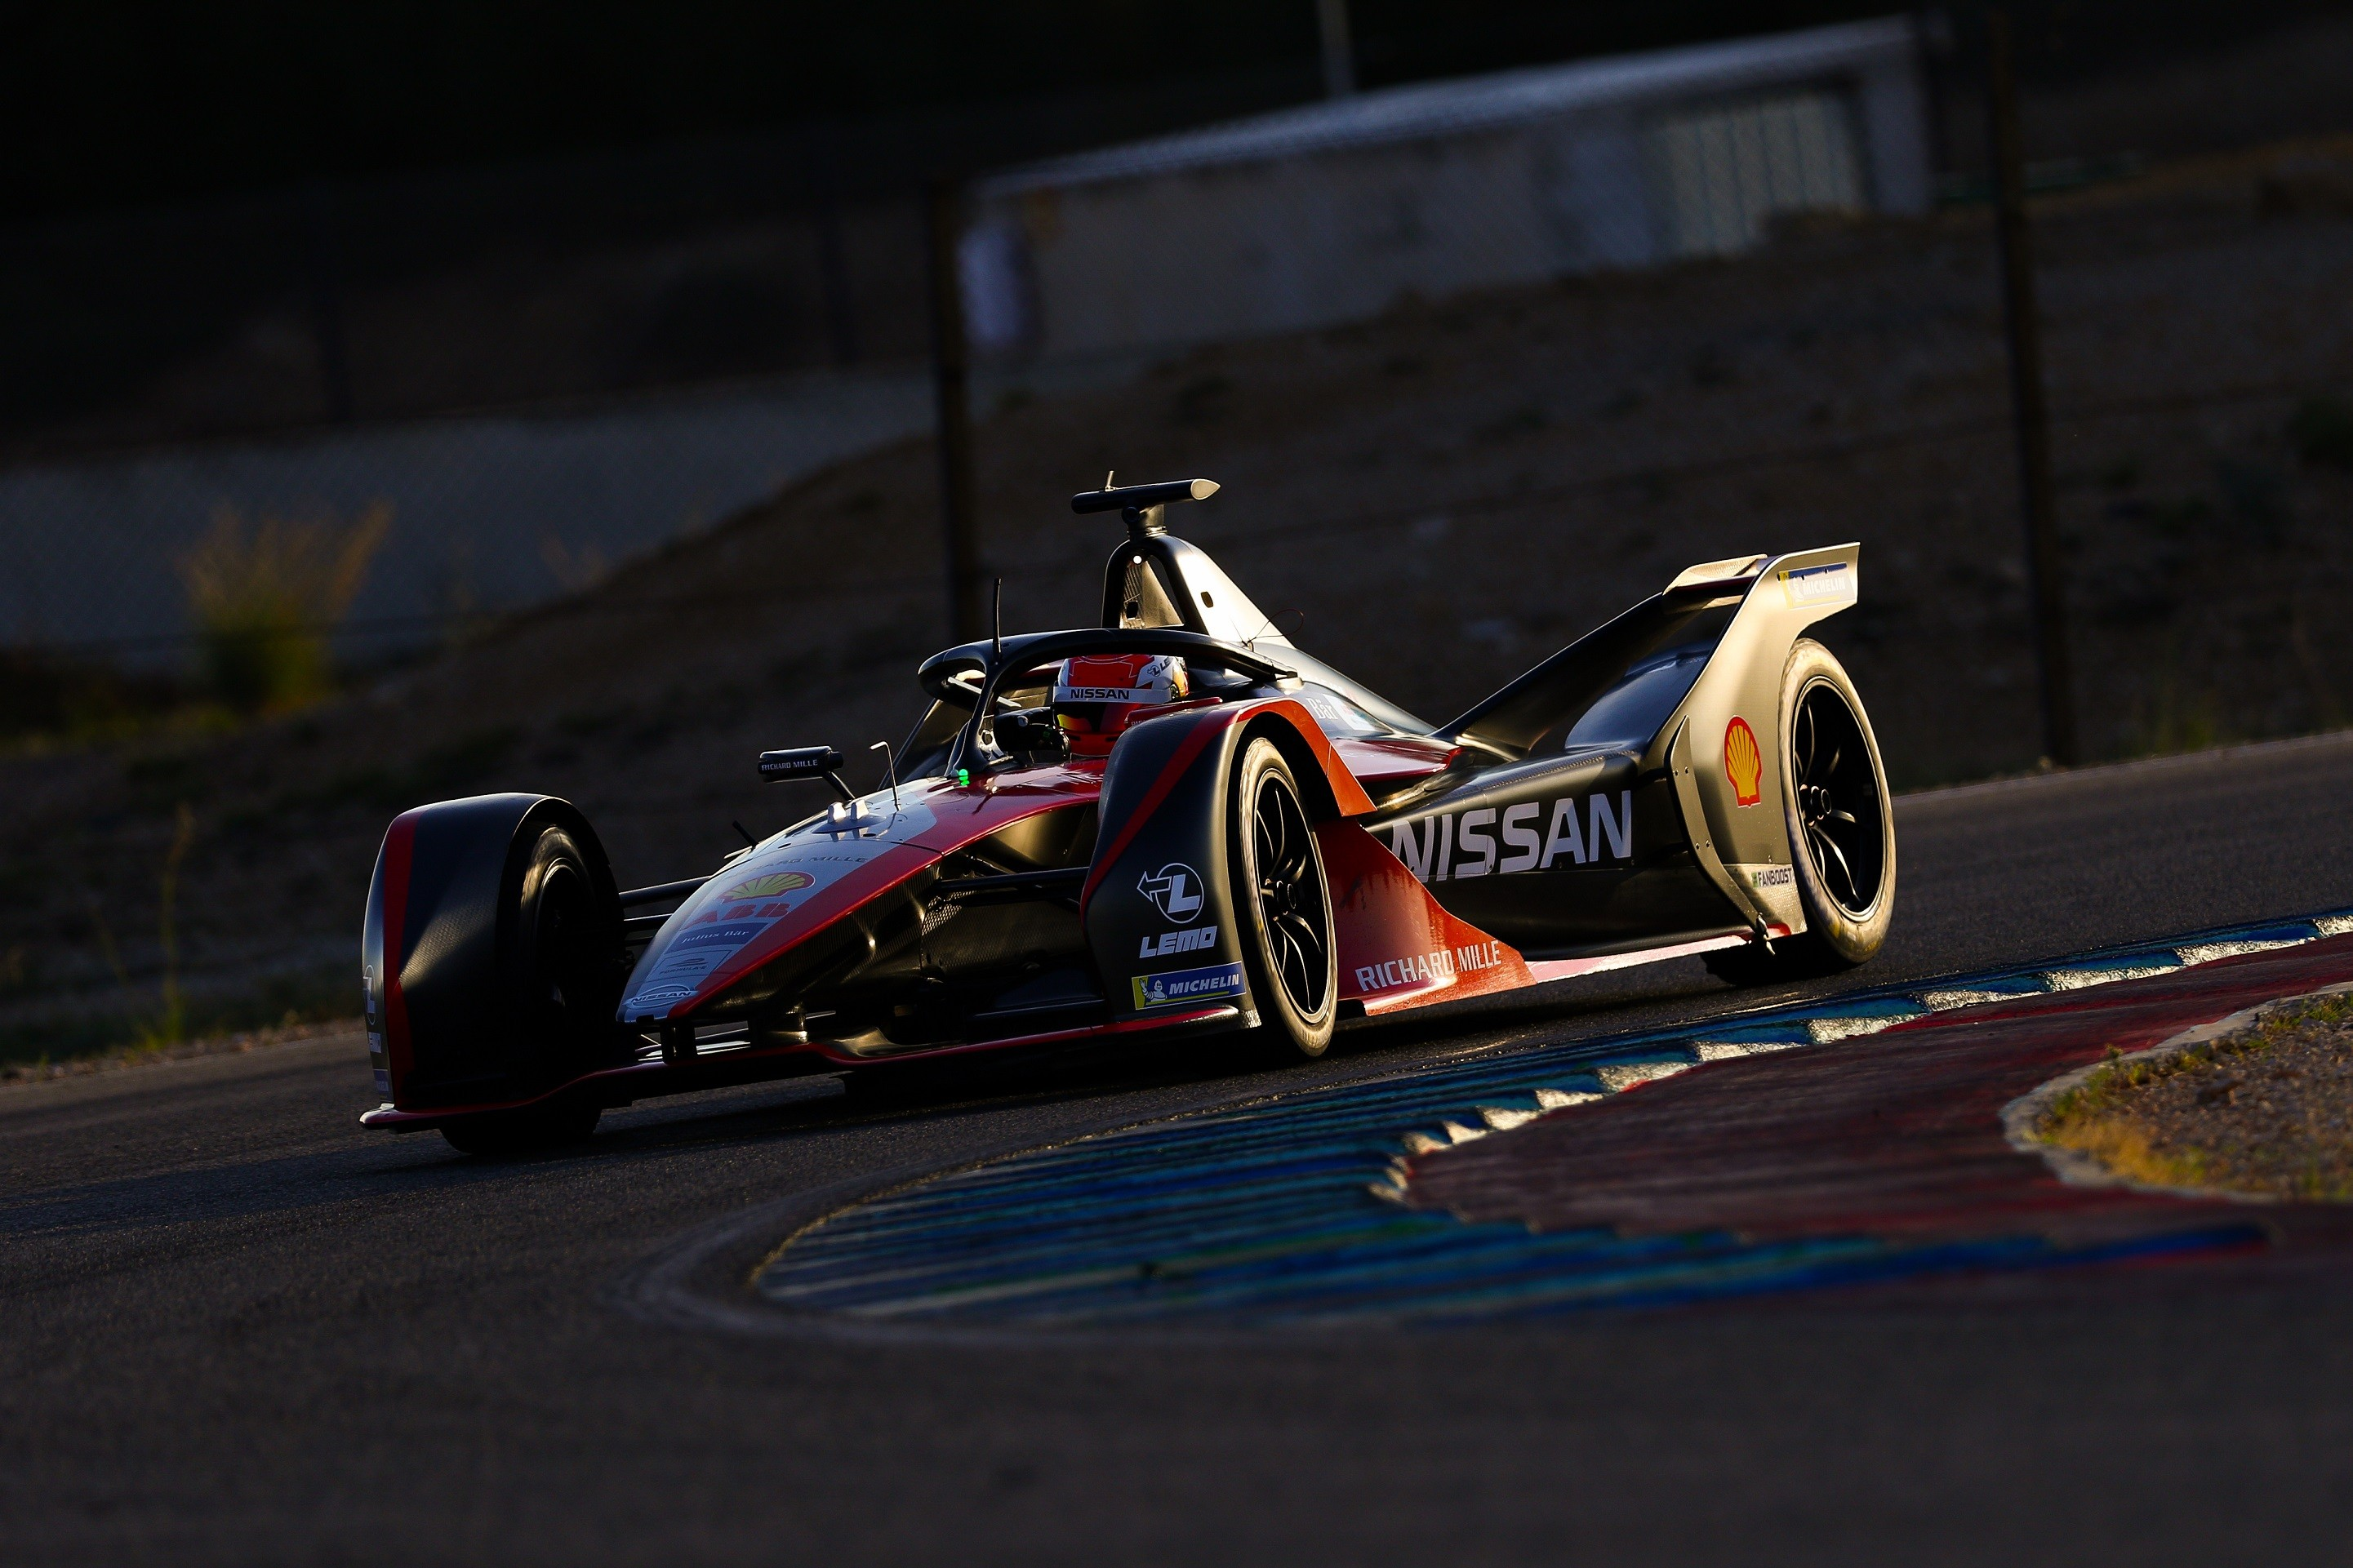 | Photographer: Shivraj Gohil| Event: Nissan Calafat test 2019| Circuit: Circuit de Calafat| Location: Barcelona| Series: FIA Formula E| Season: 2019-2020| Country: Spain || Driver: Sebastien Buemi| Team: Nissan e.dams| Number: 23| Car: IM02|